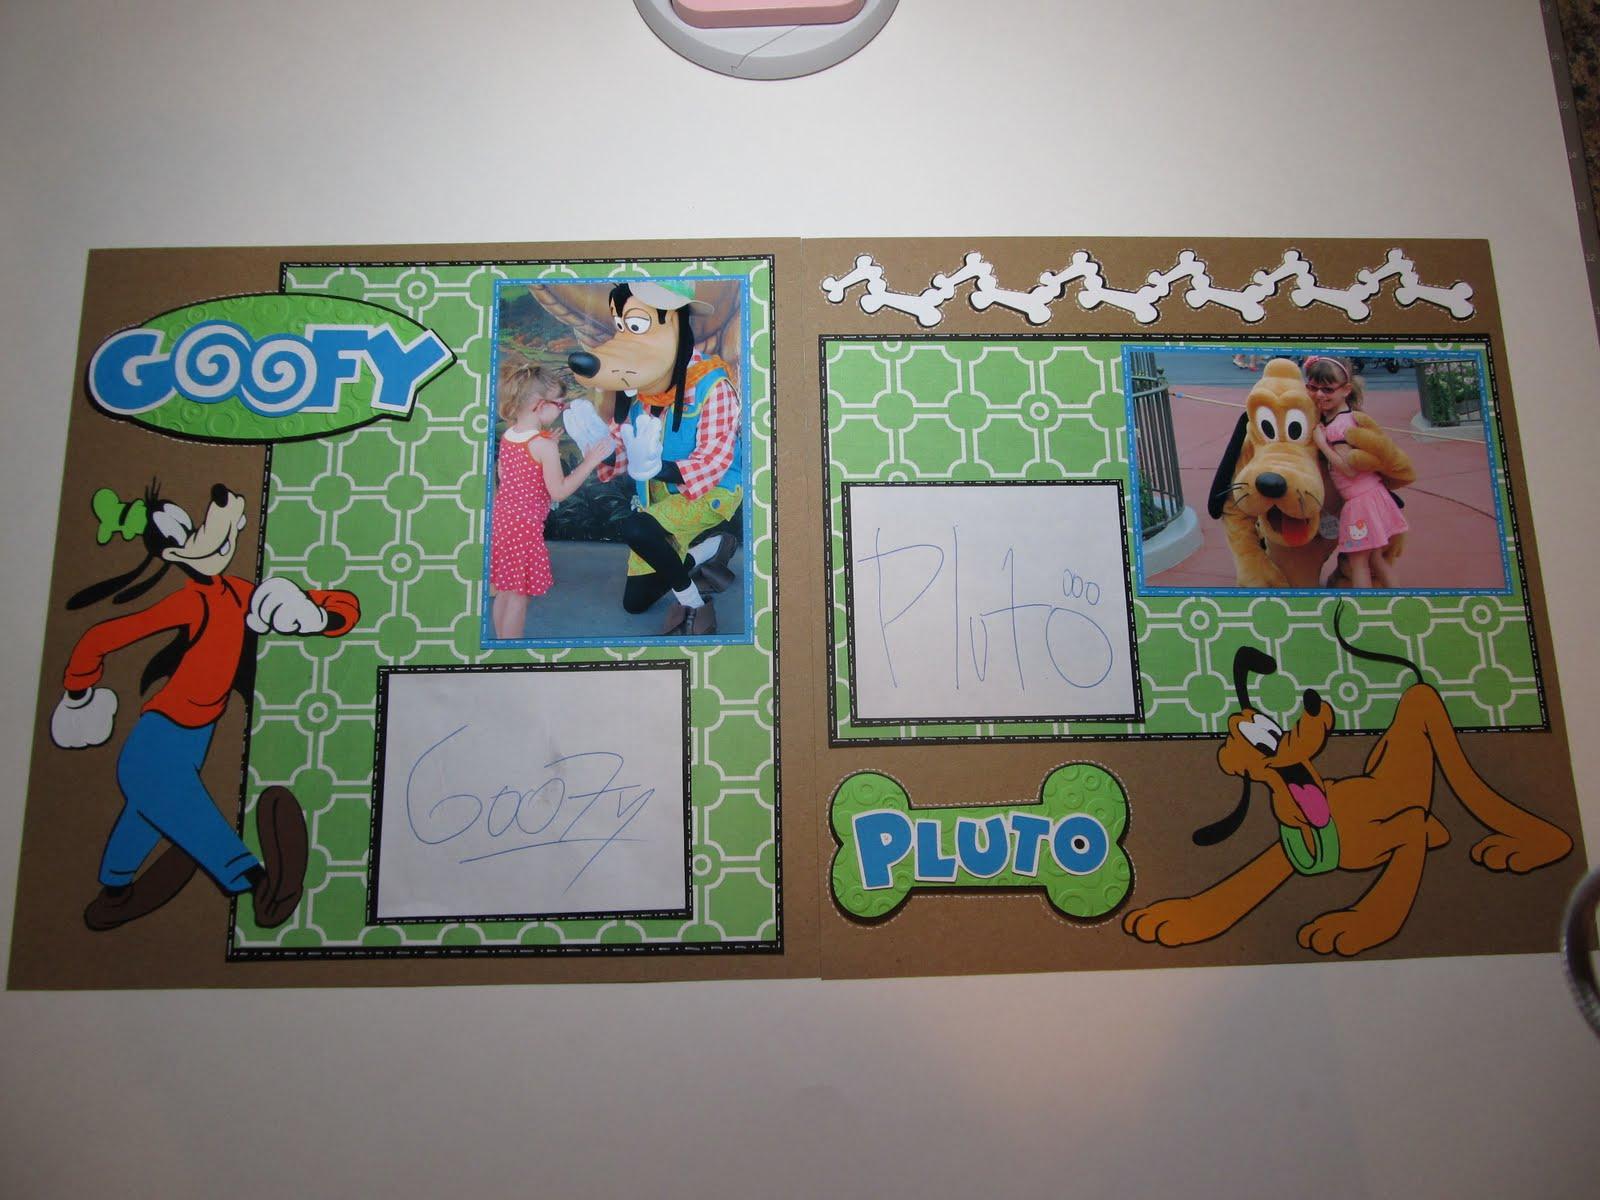 Disney scrapbook ideas - Goofy And Pluto Scrapbook Layout